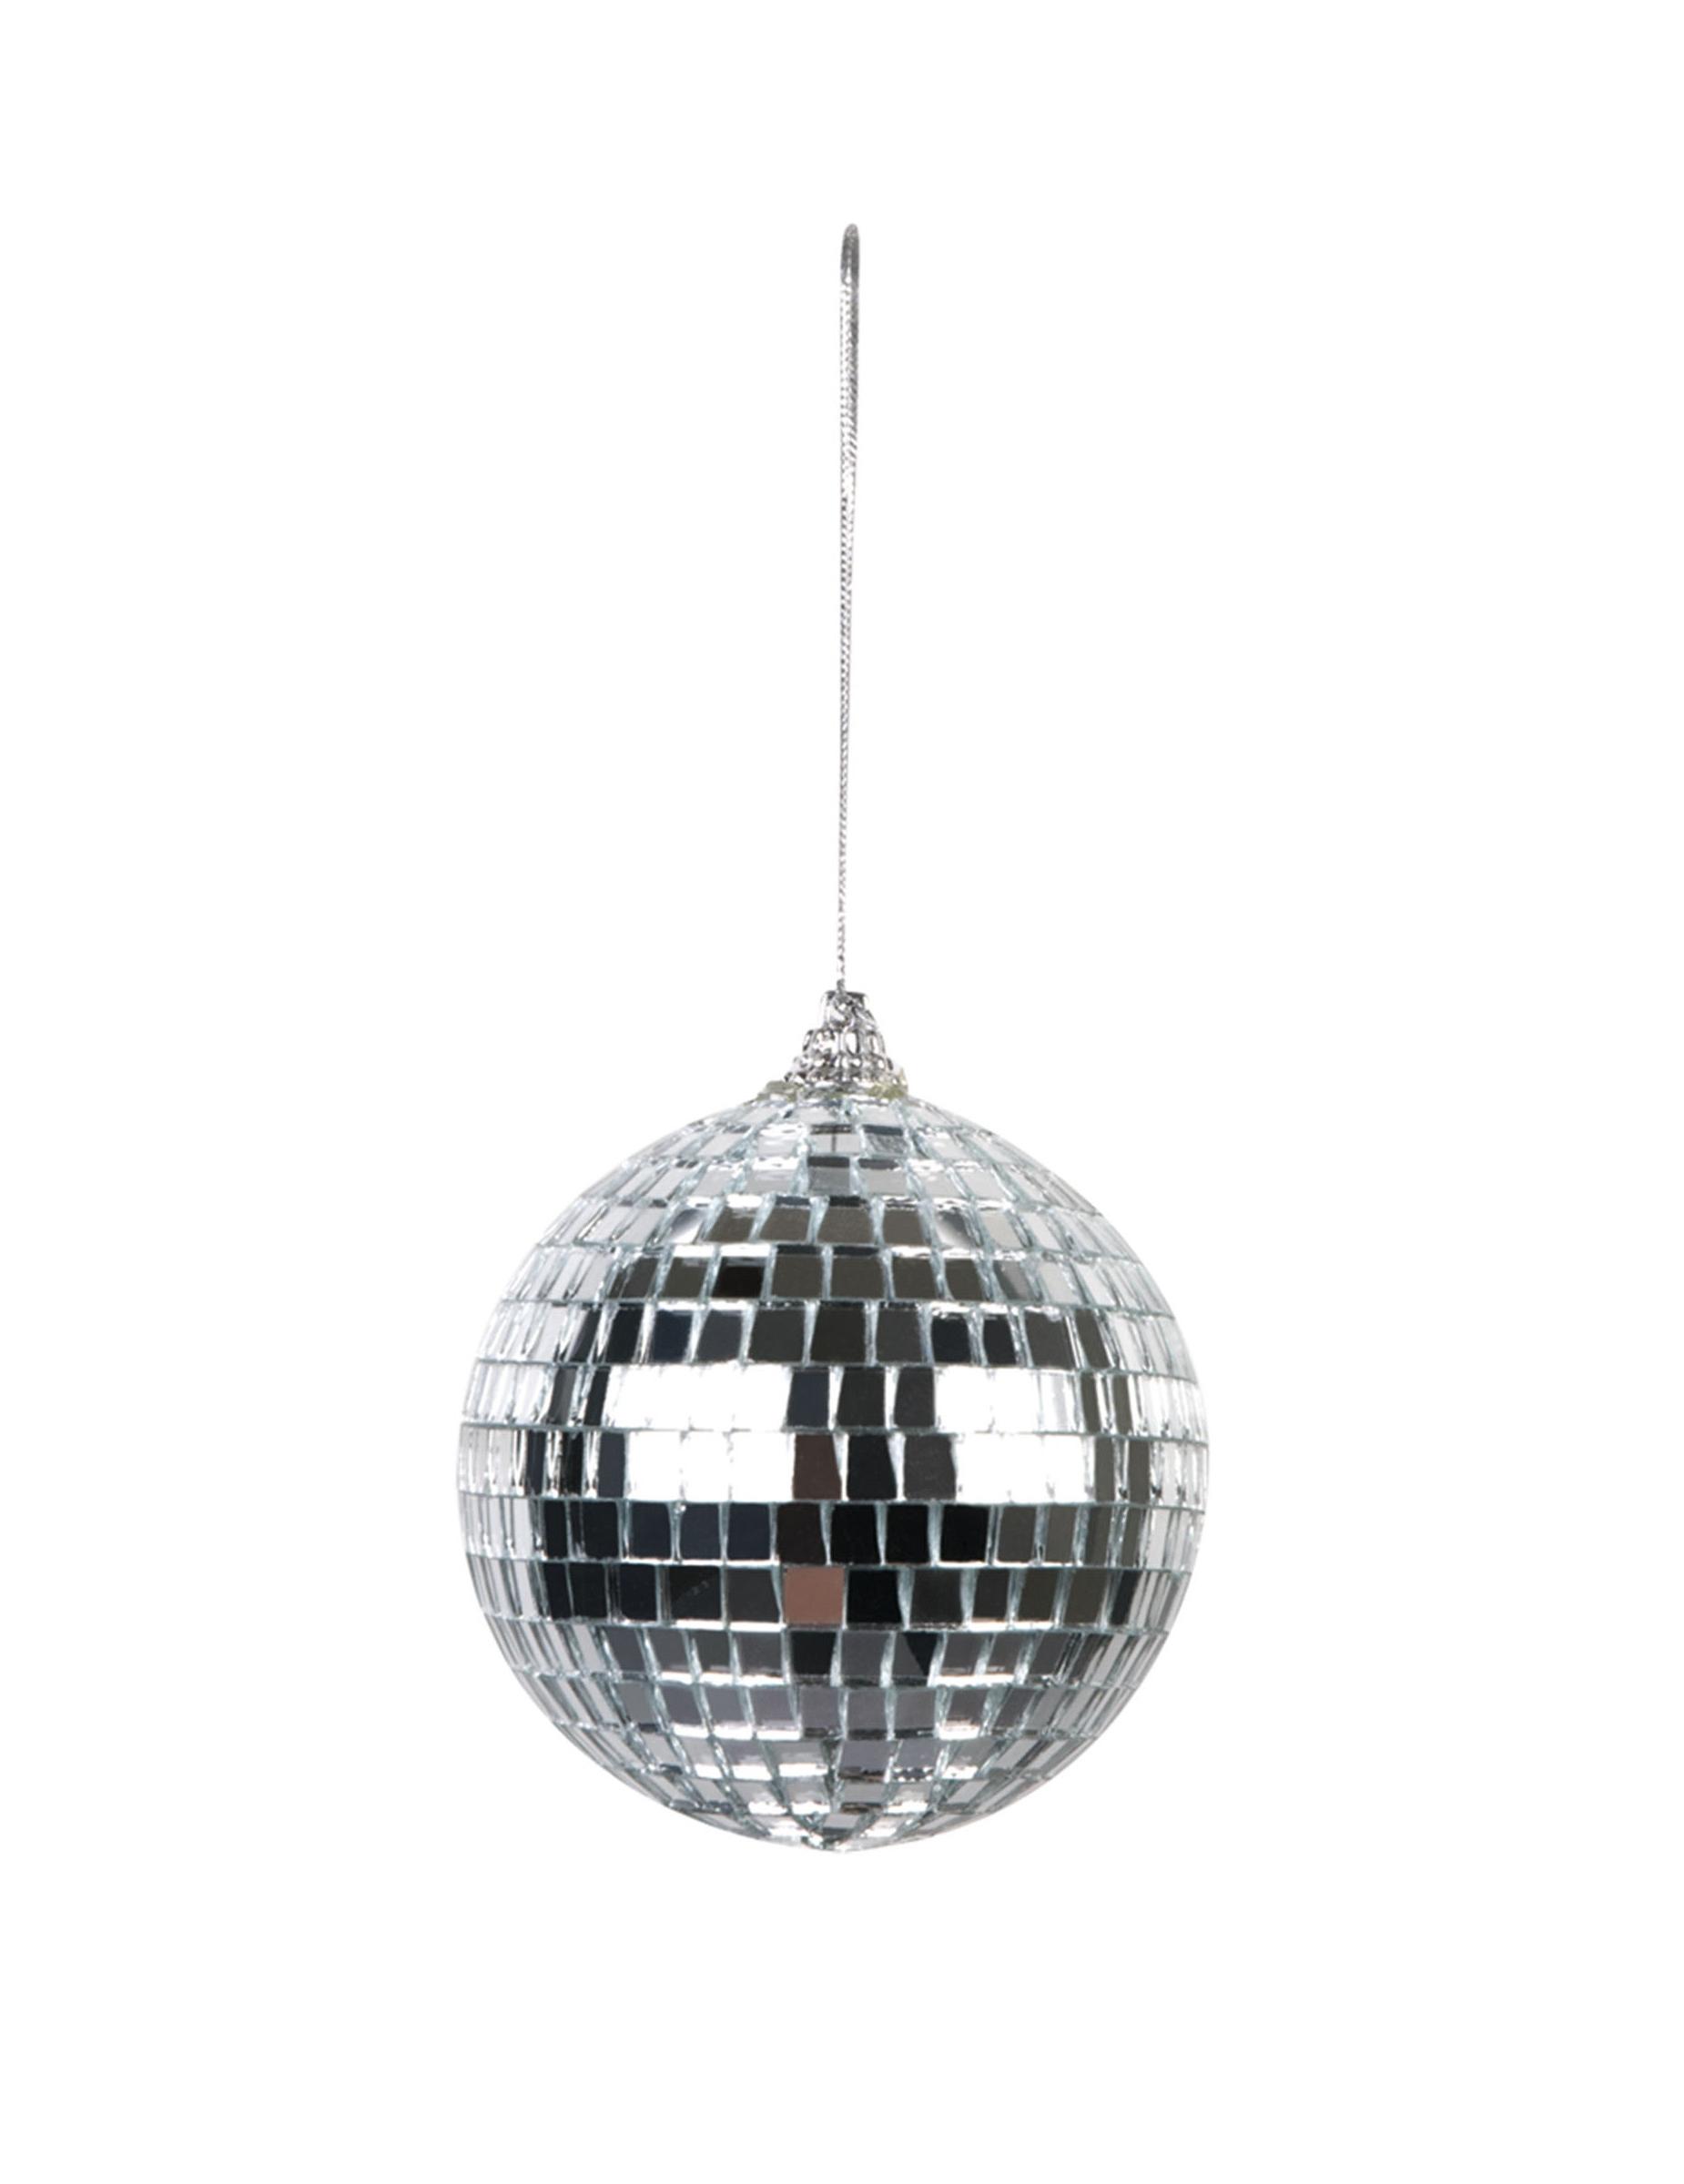 6 Mini-Discokugeln 153638